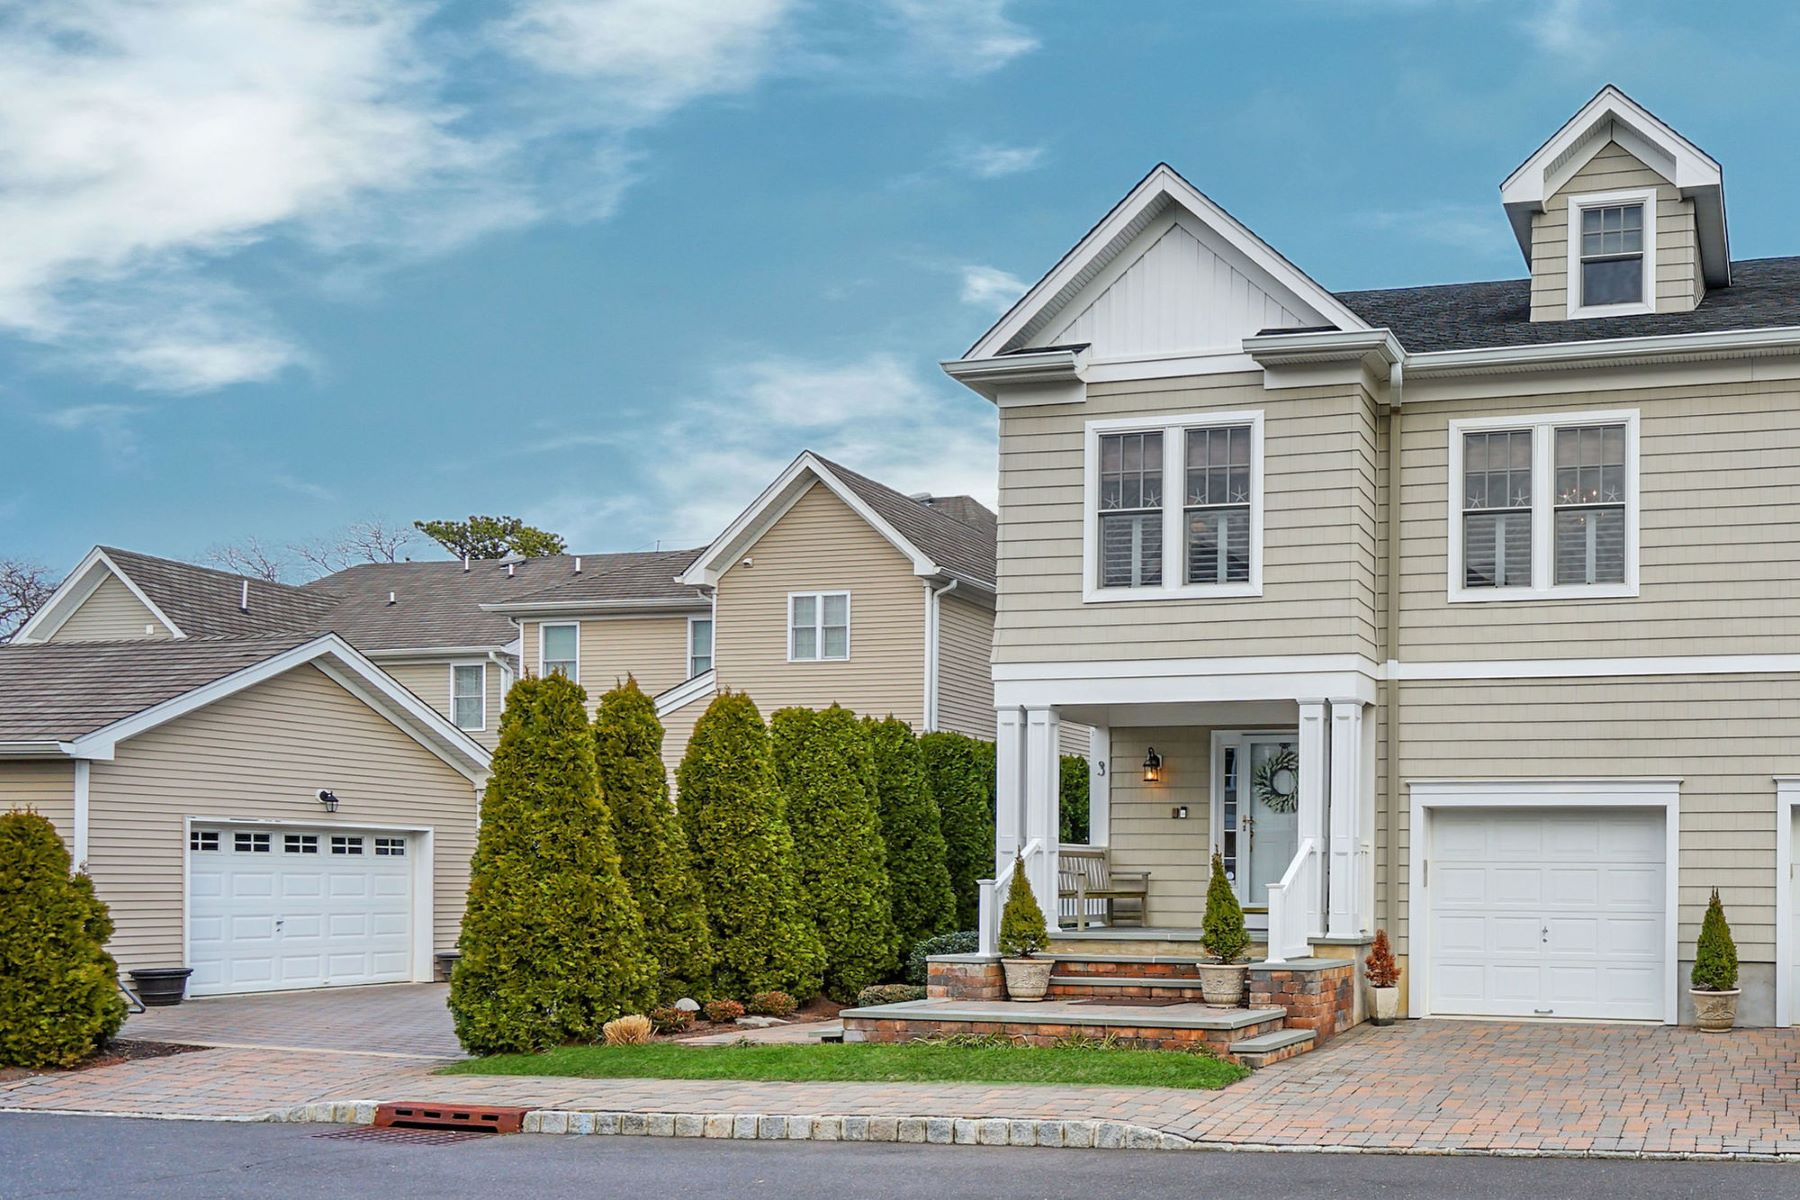 Condominiums for Sale at Westport at Belmar 3 Marina Court Unit 3 Belmar, New Jersey 07719 United States